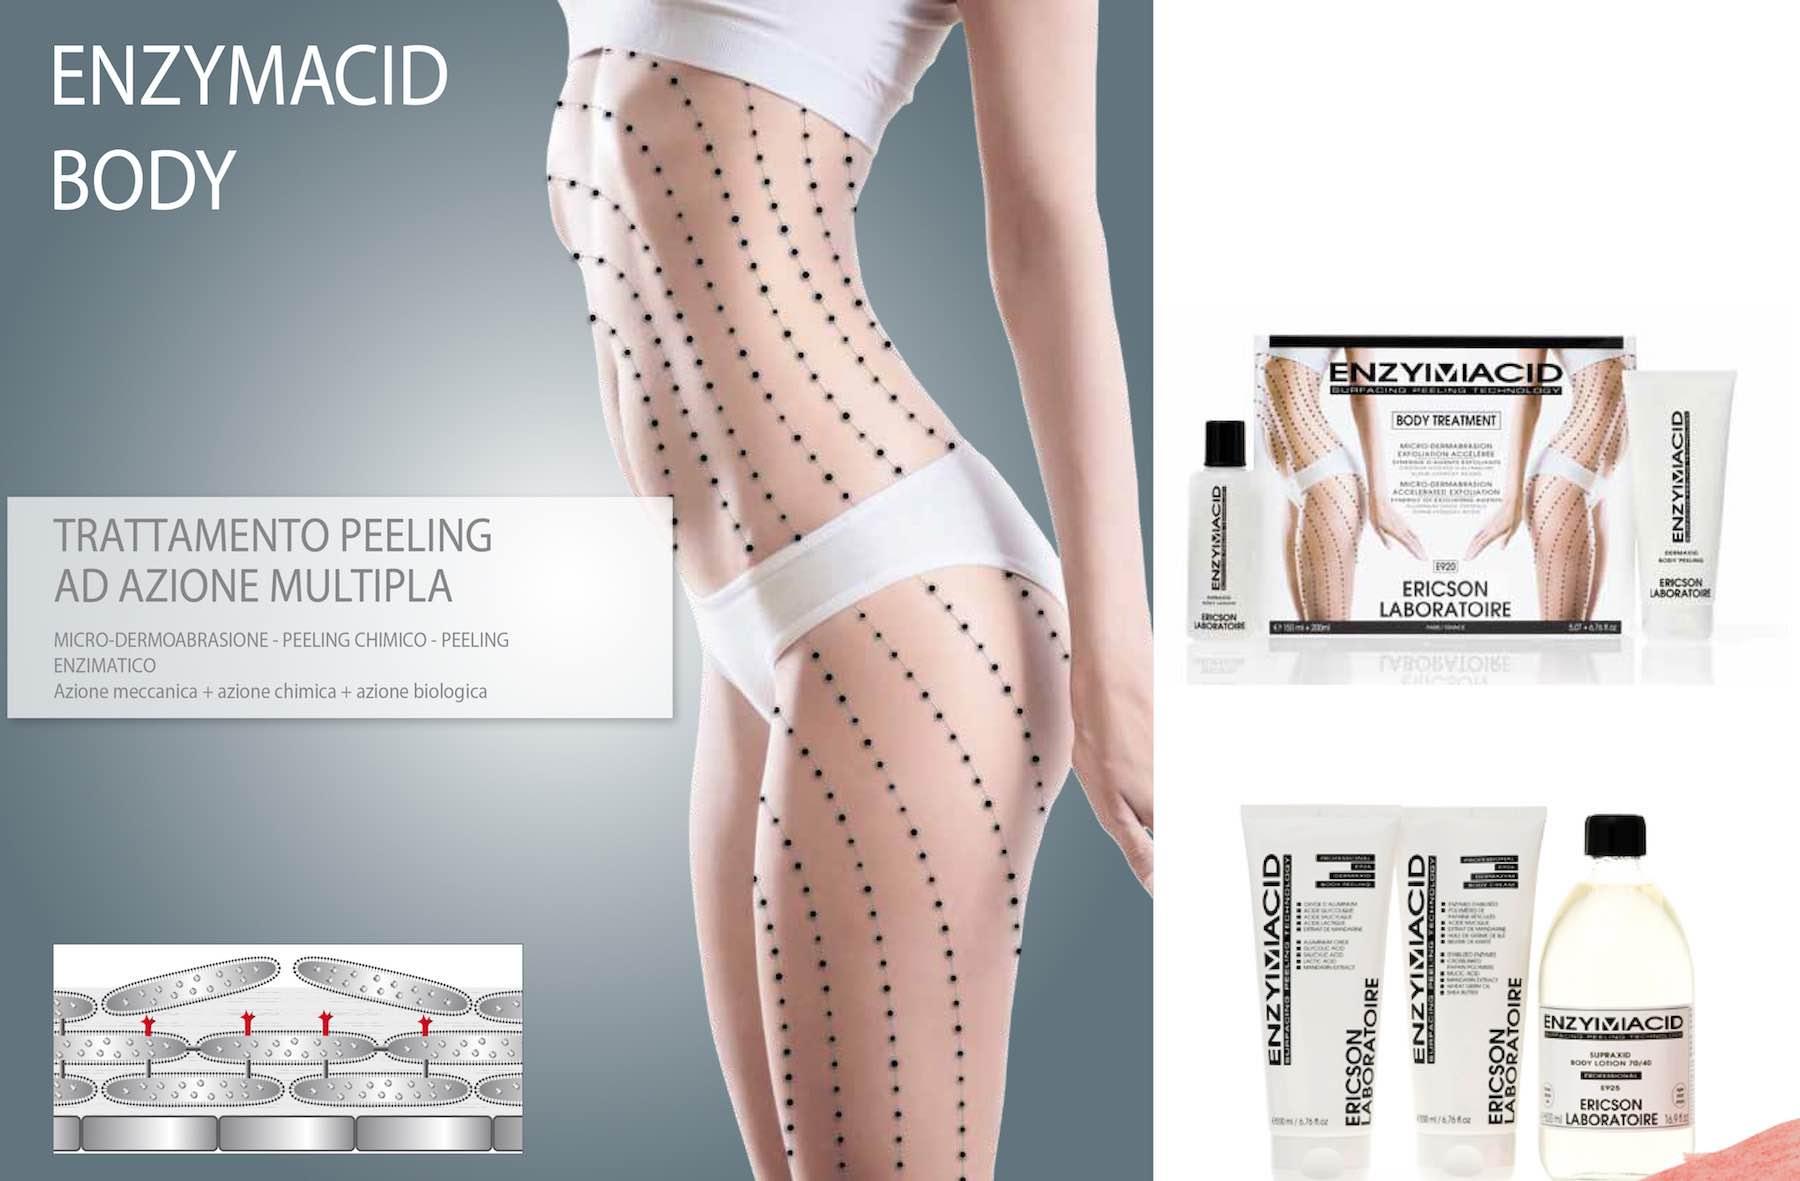 Jerà Beauty - Body - Ericson - Laboratoire-enzymacid body